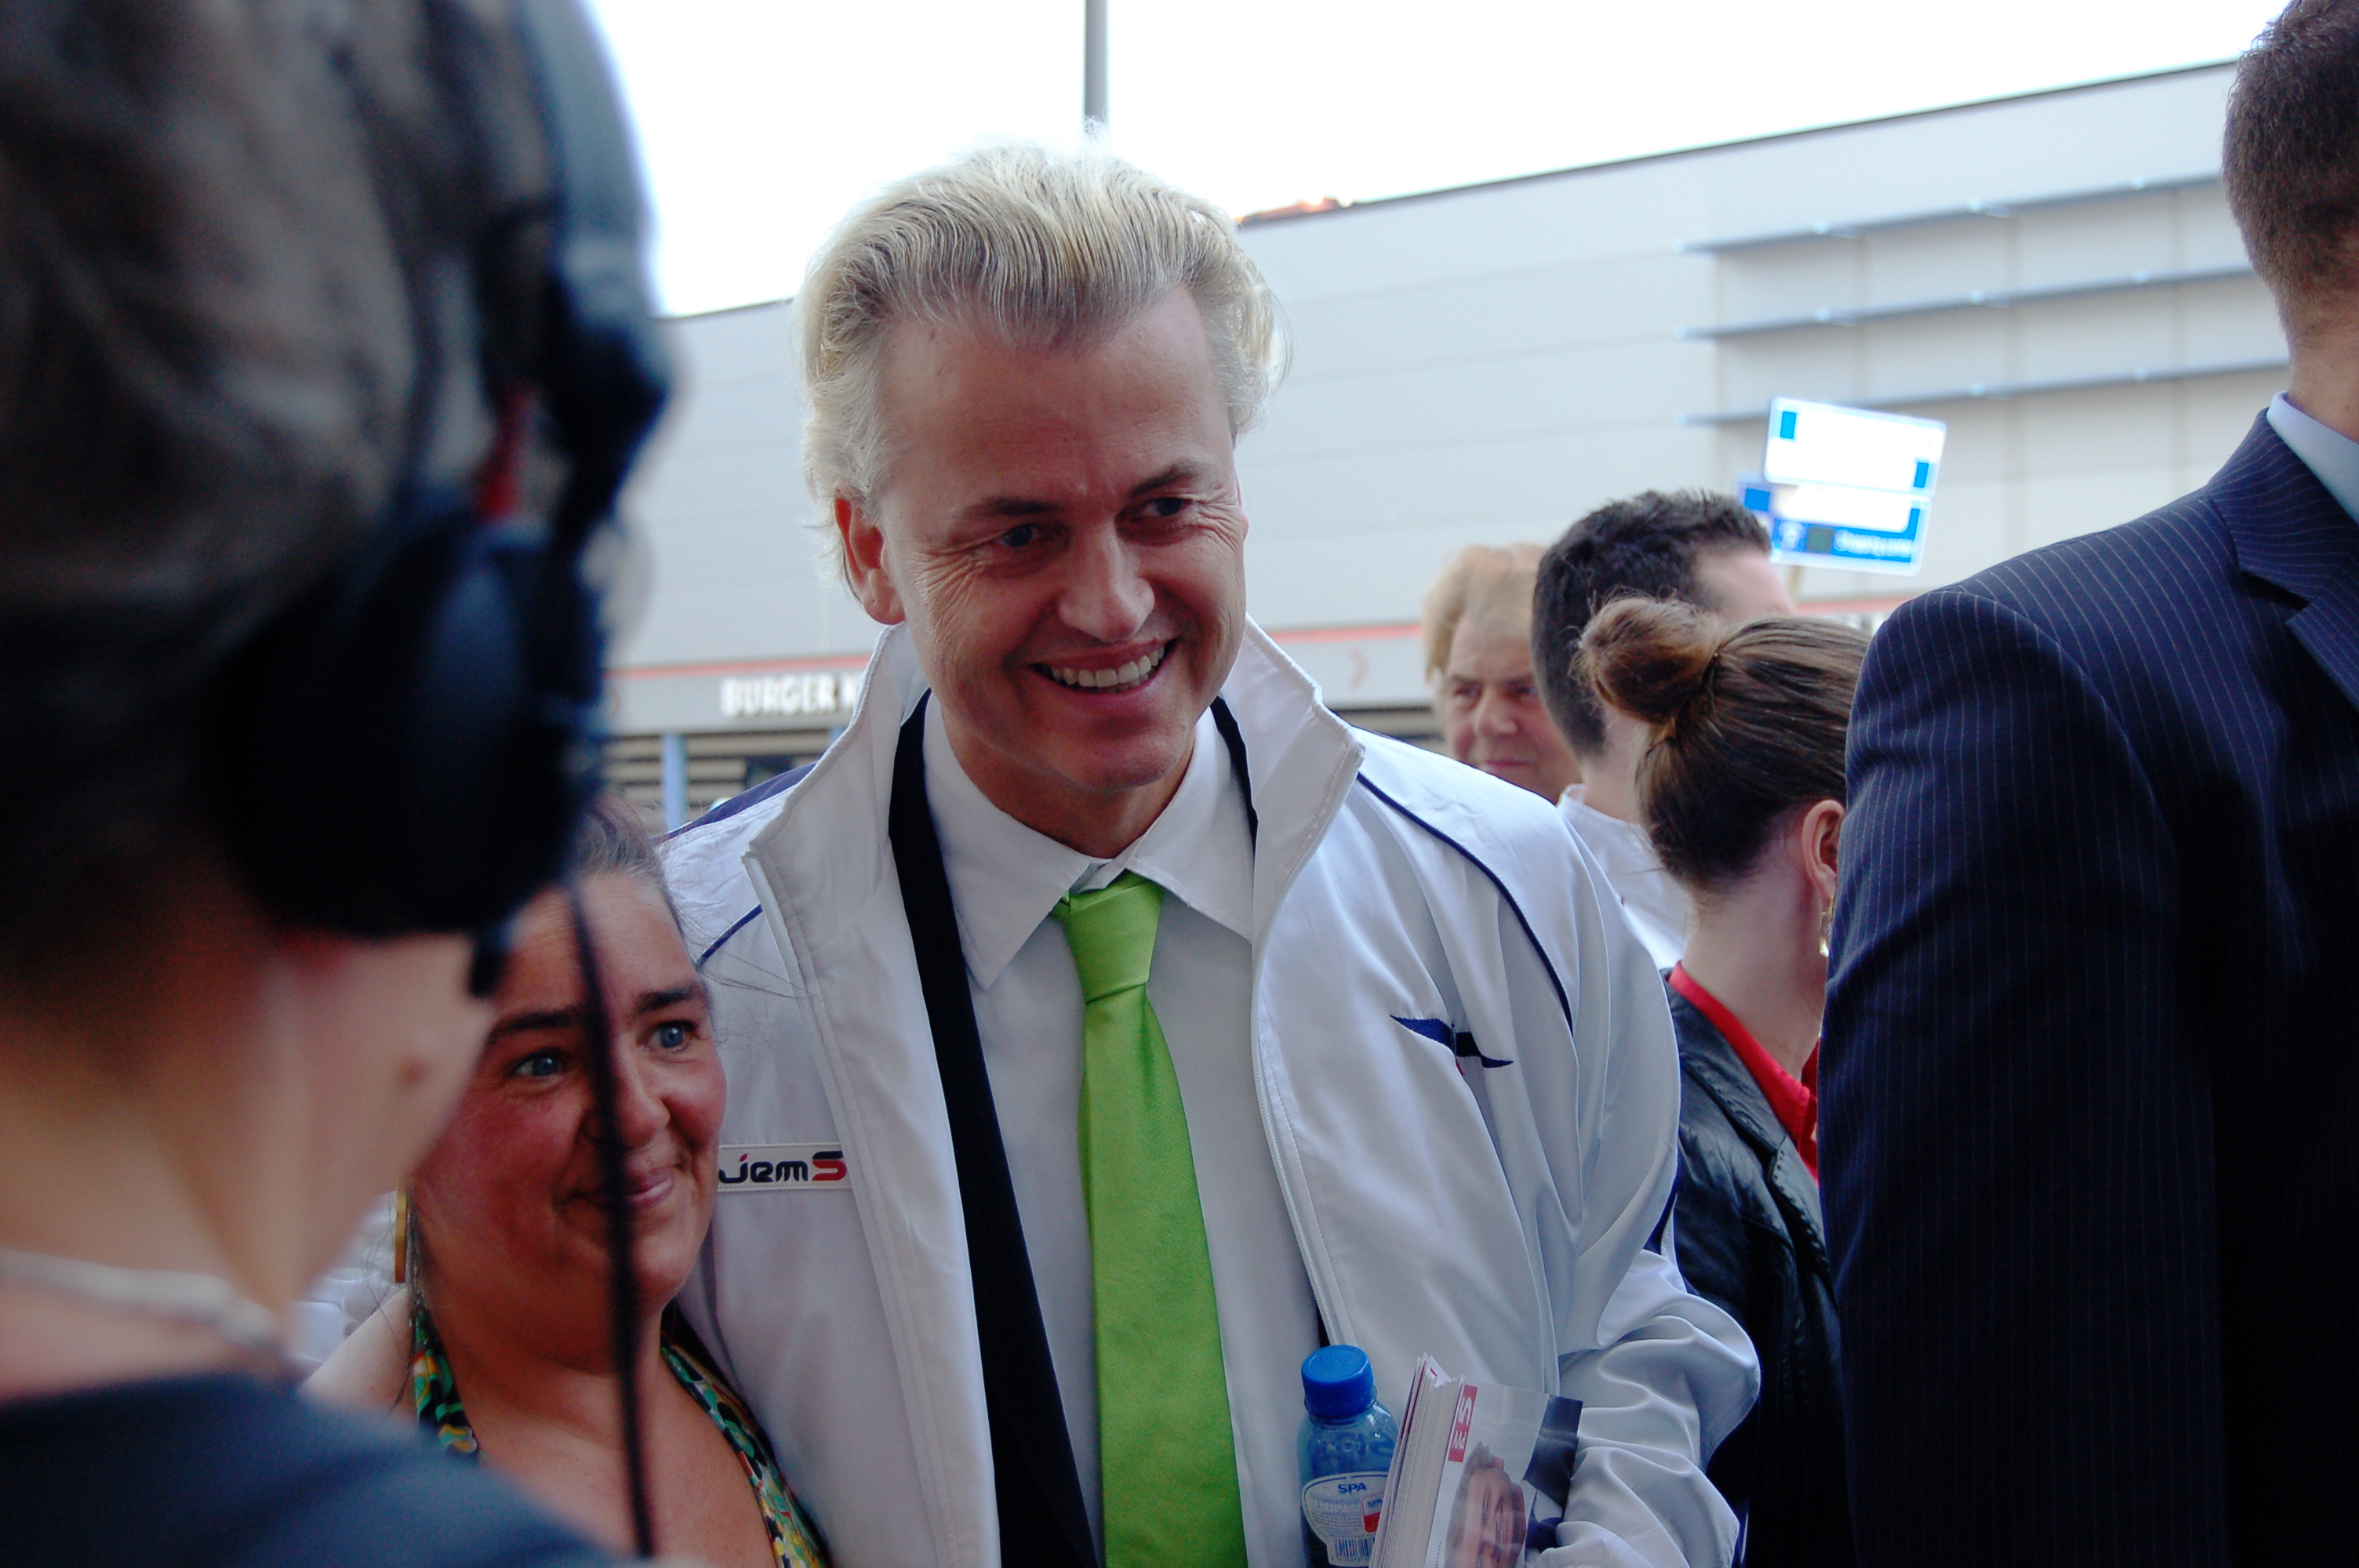 Dutch politician acquitted of inciting discrimination with anti-Islam rhetoric